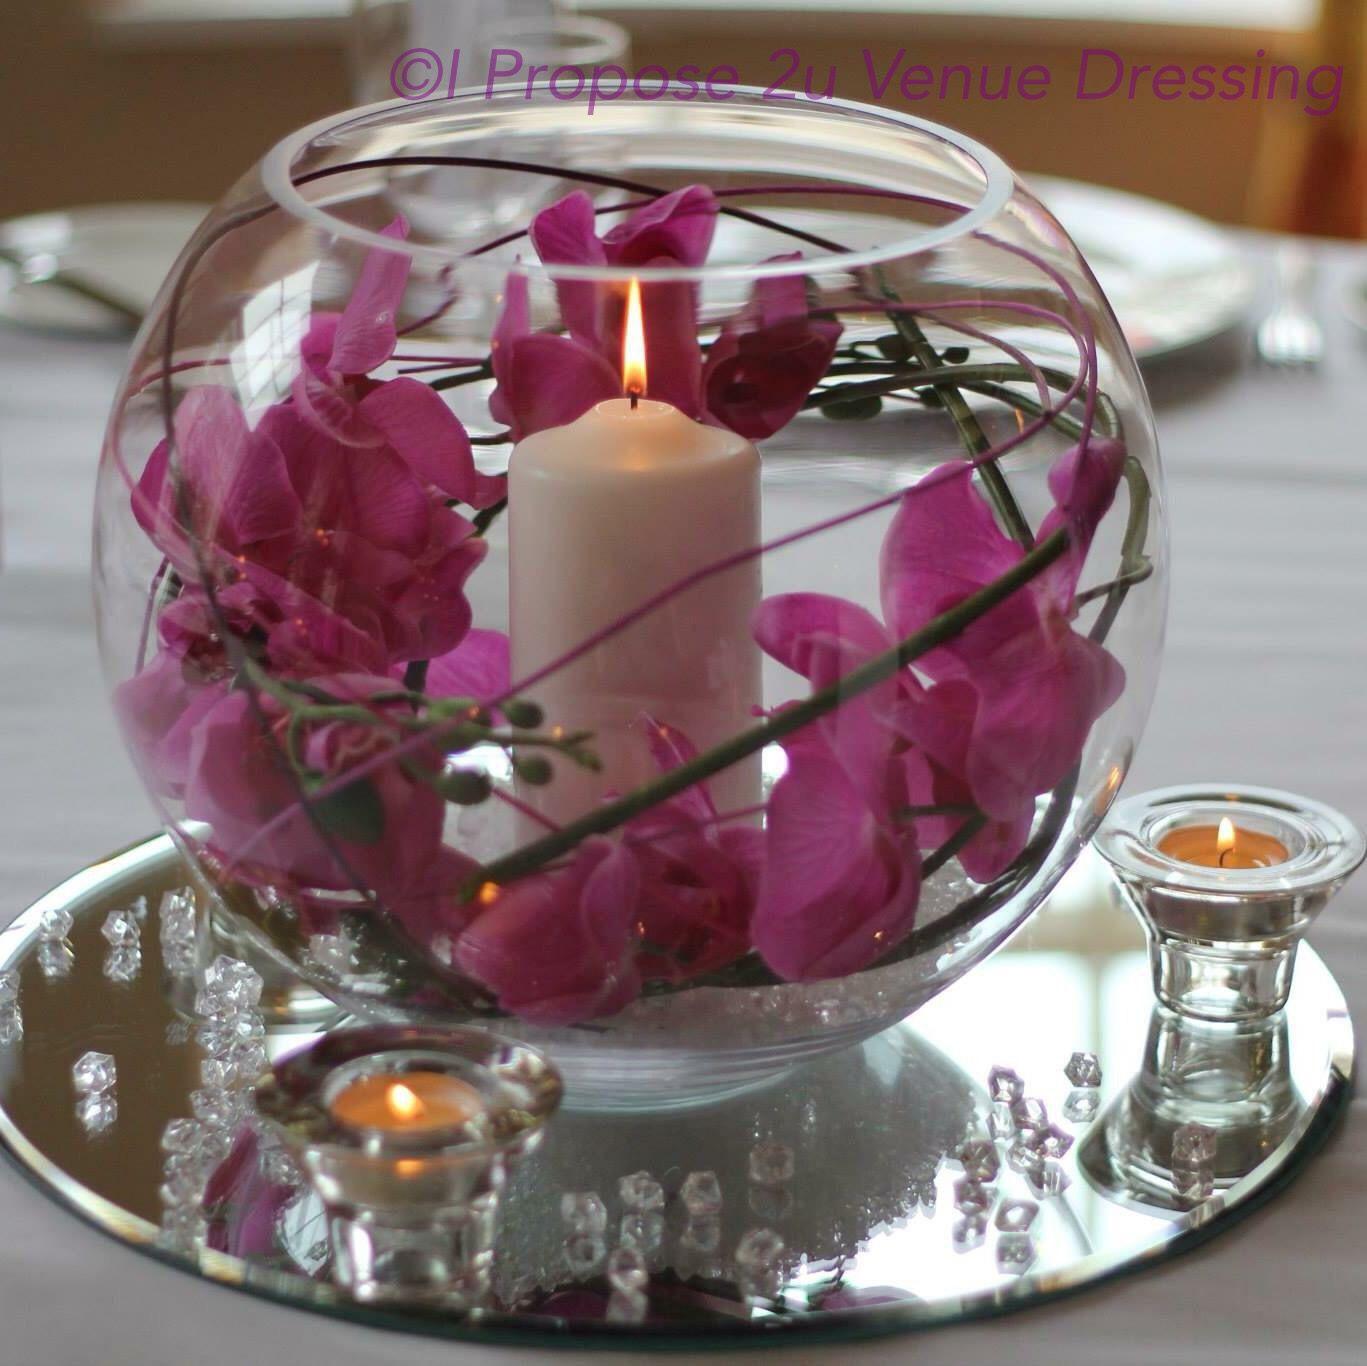 Wedding Decorations Glass Bowls Large Glass Bowl Centrepiece I Propose 2U  Pinterest  Large